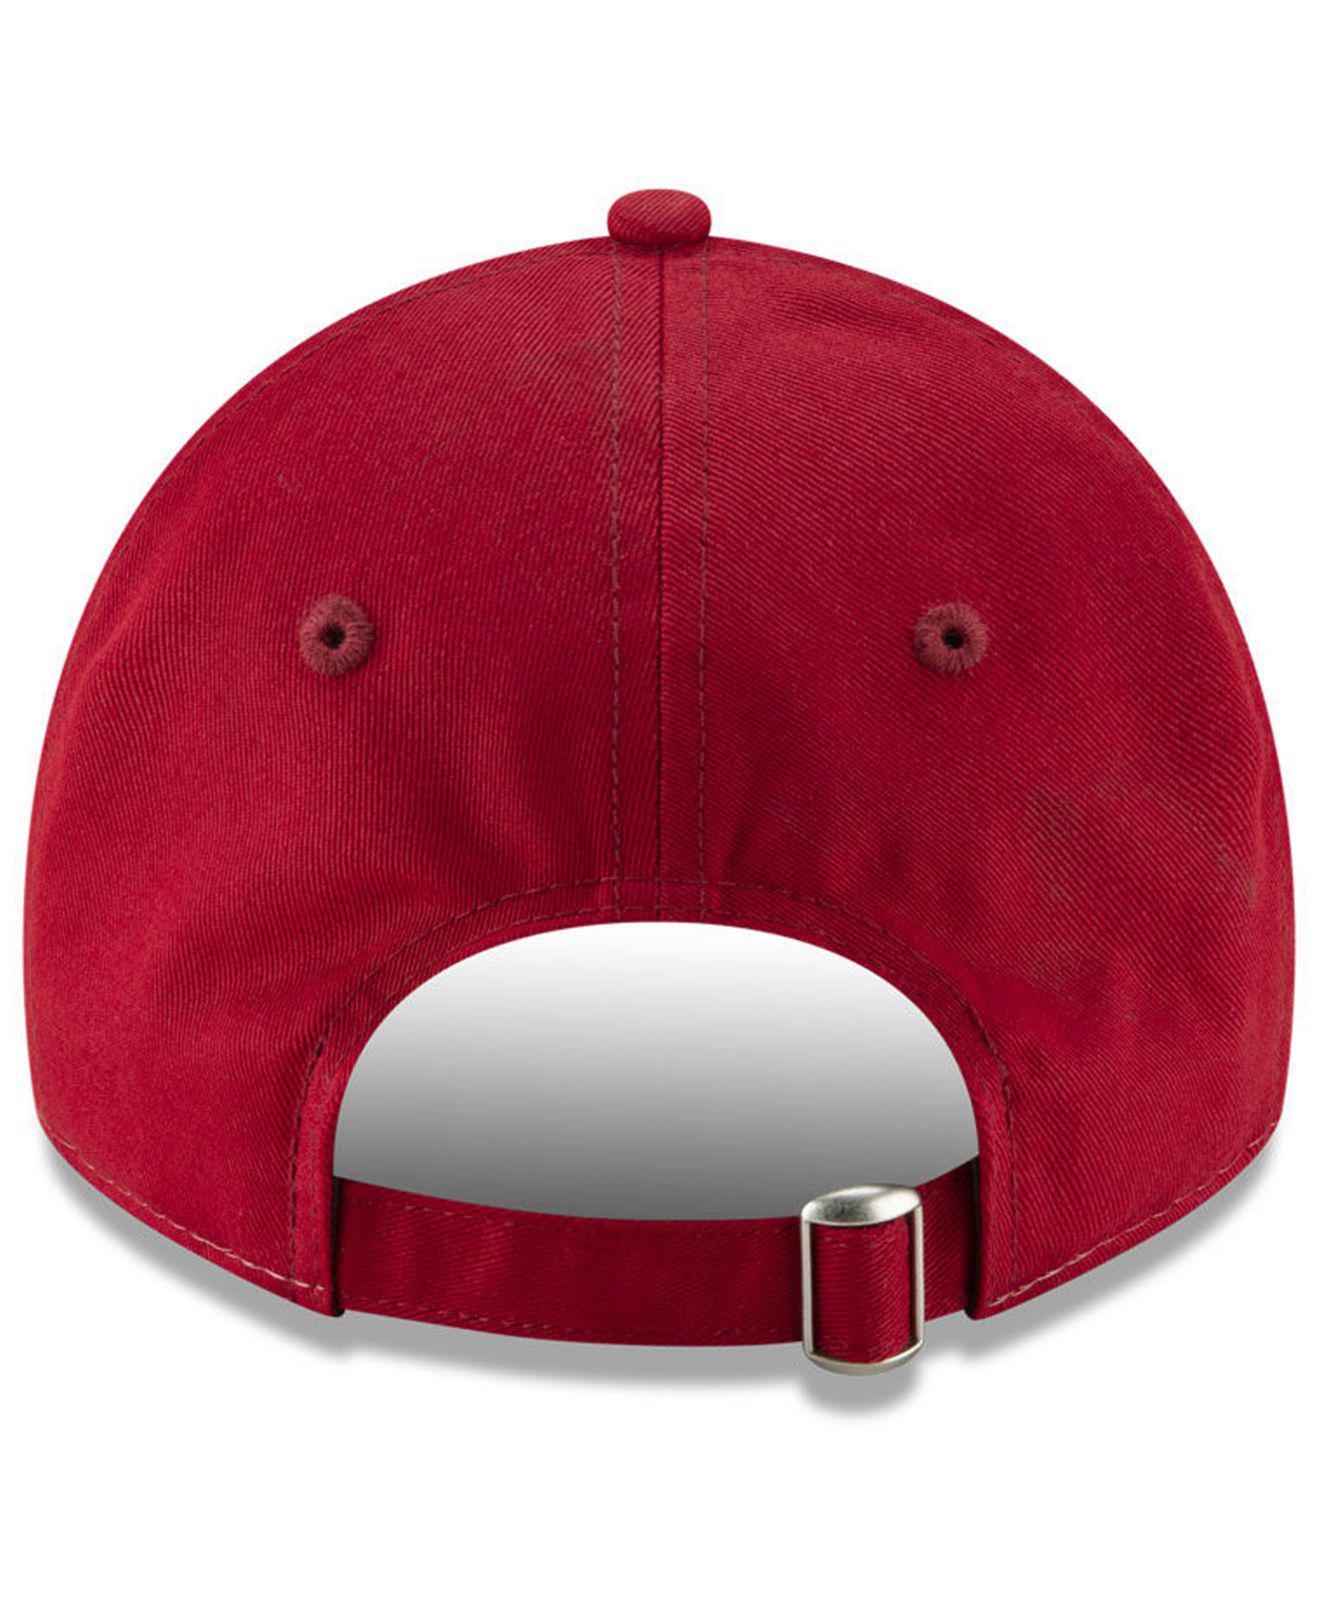 size 40 d4f15 0cec3 ... inexpensive arizona cardinals gray glitter 9twenty cap lyst. view  fullscreen 3ce4c 831d0